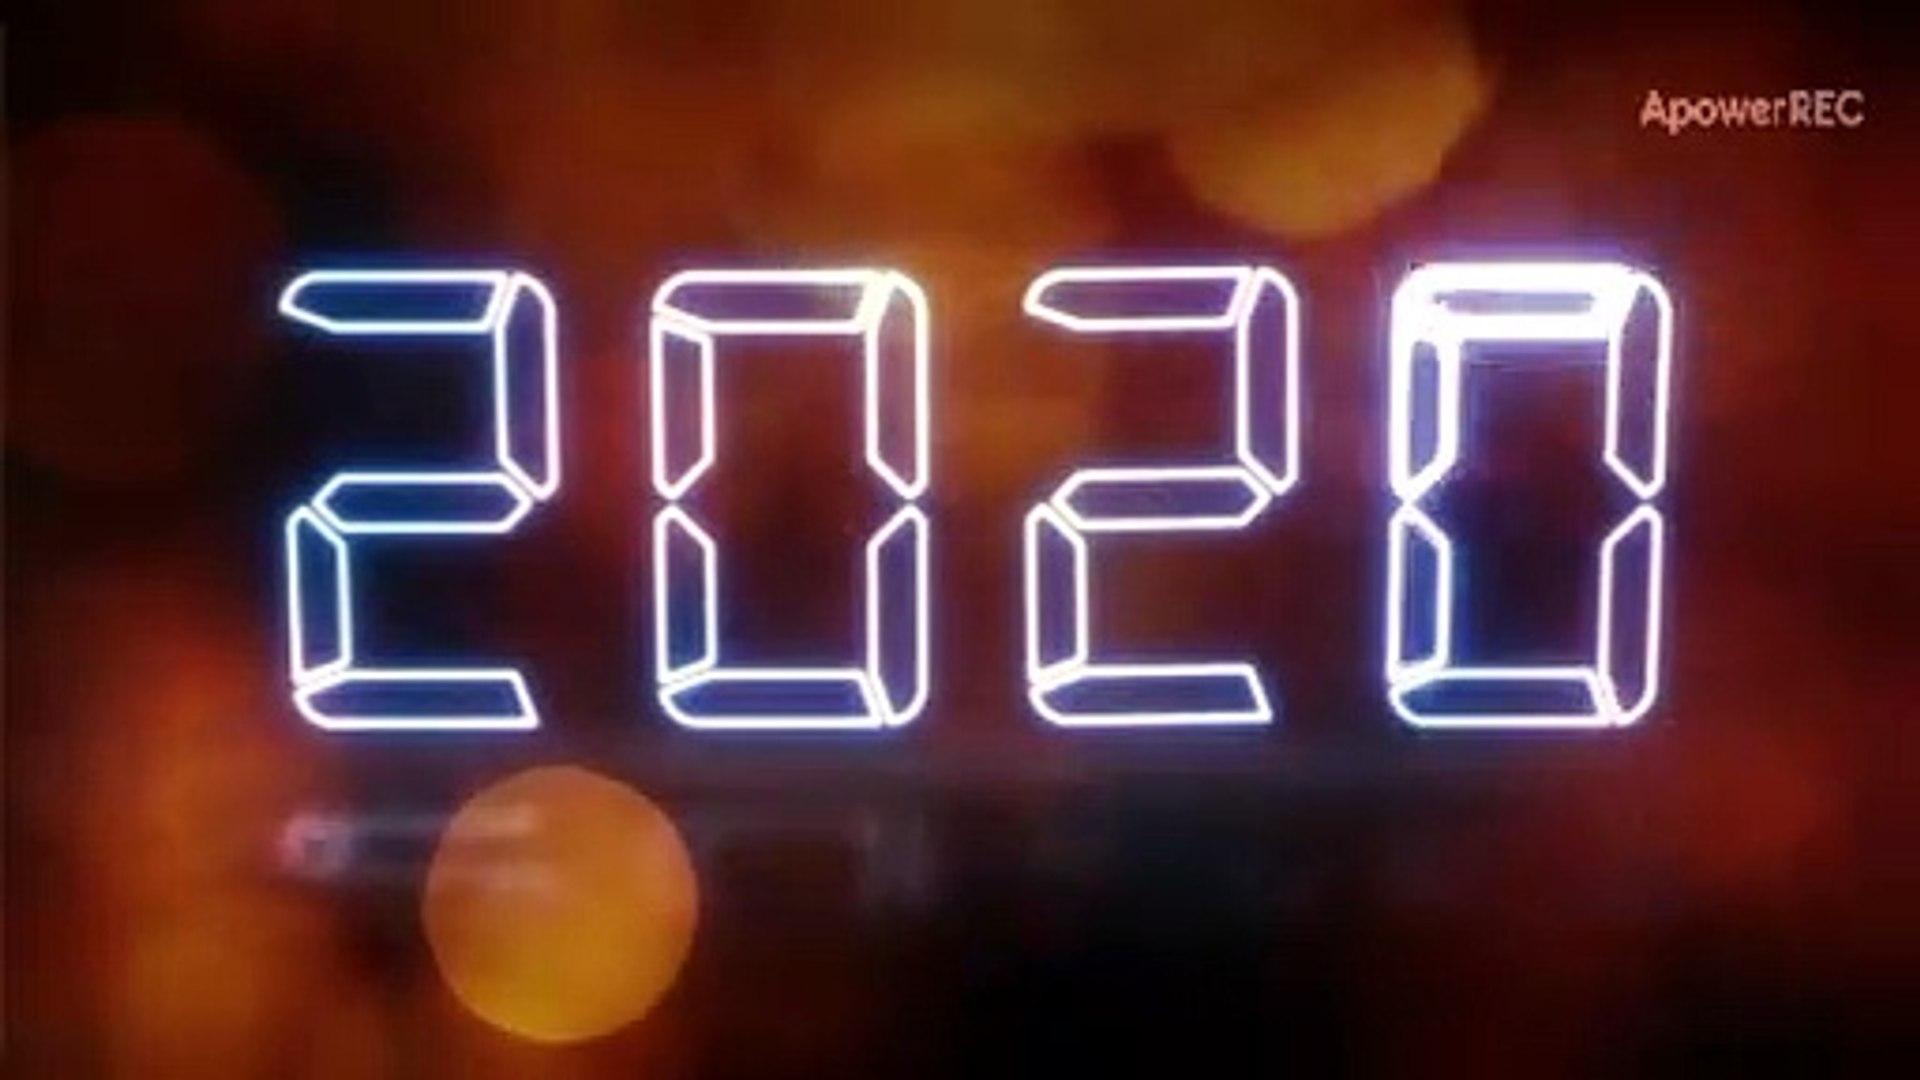 (2020) HAPPY NEW YEAR WHATSAAP STATUS WISHES 2020 TWITTER INSTAGRAM FACEBOOK